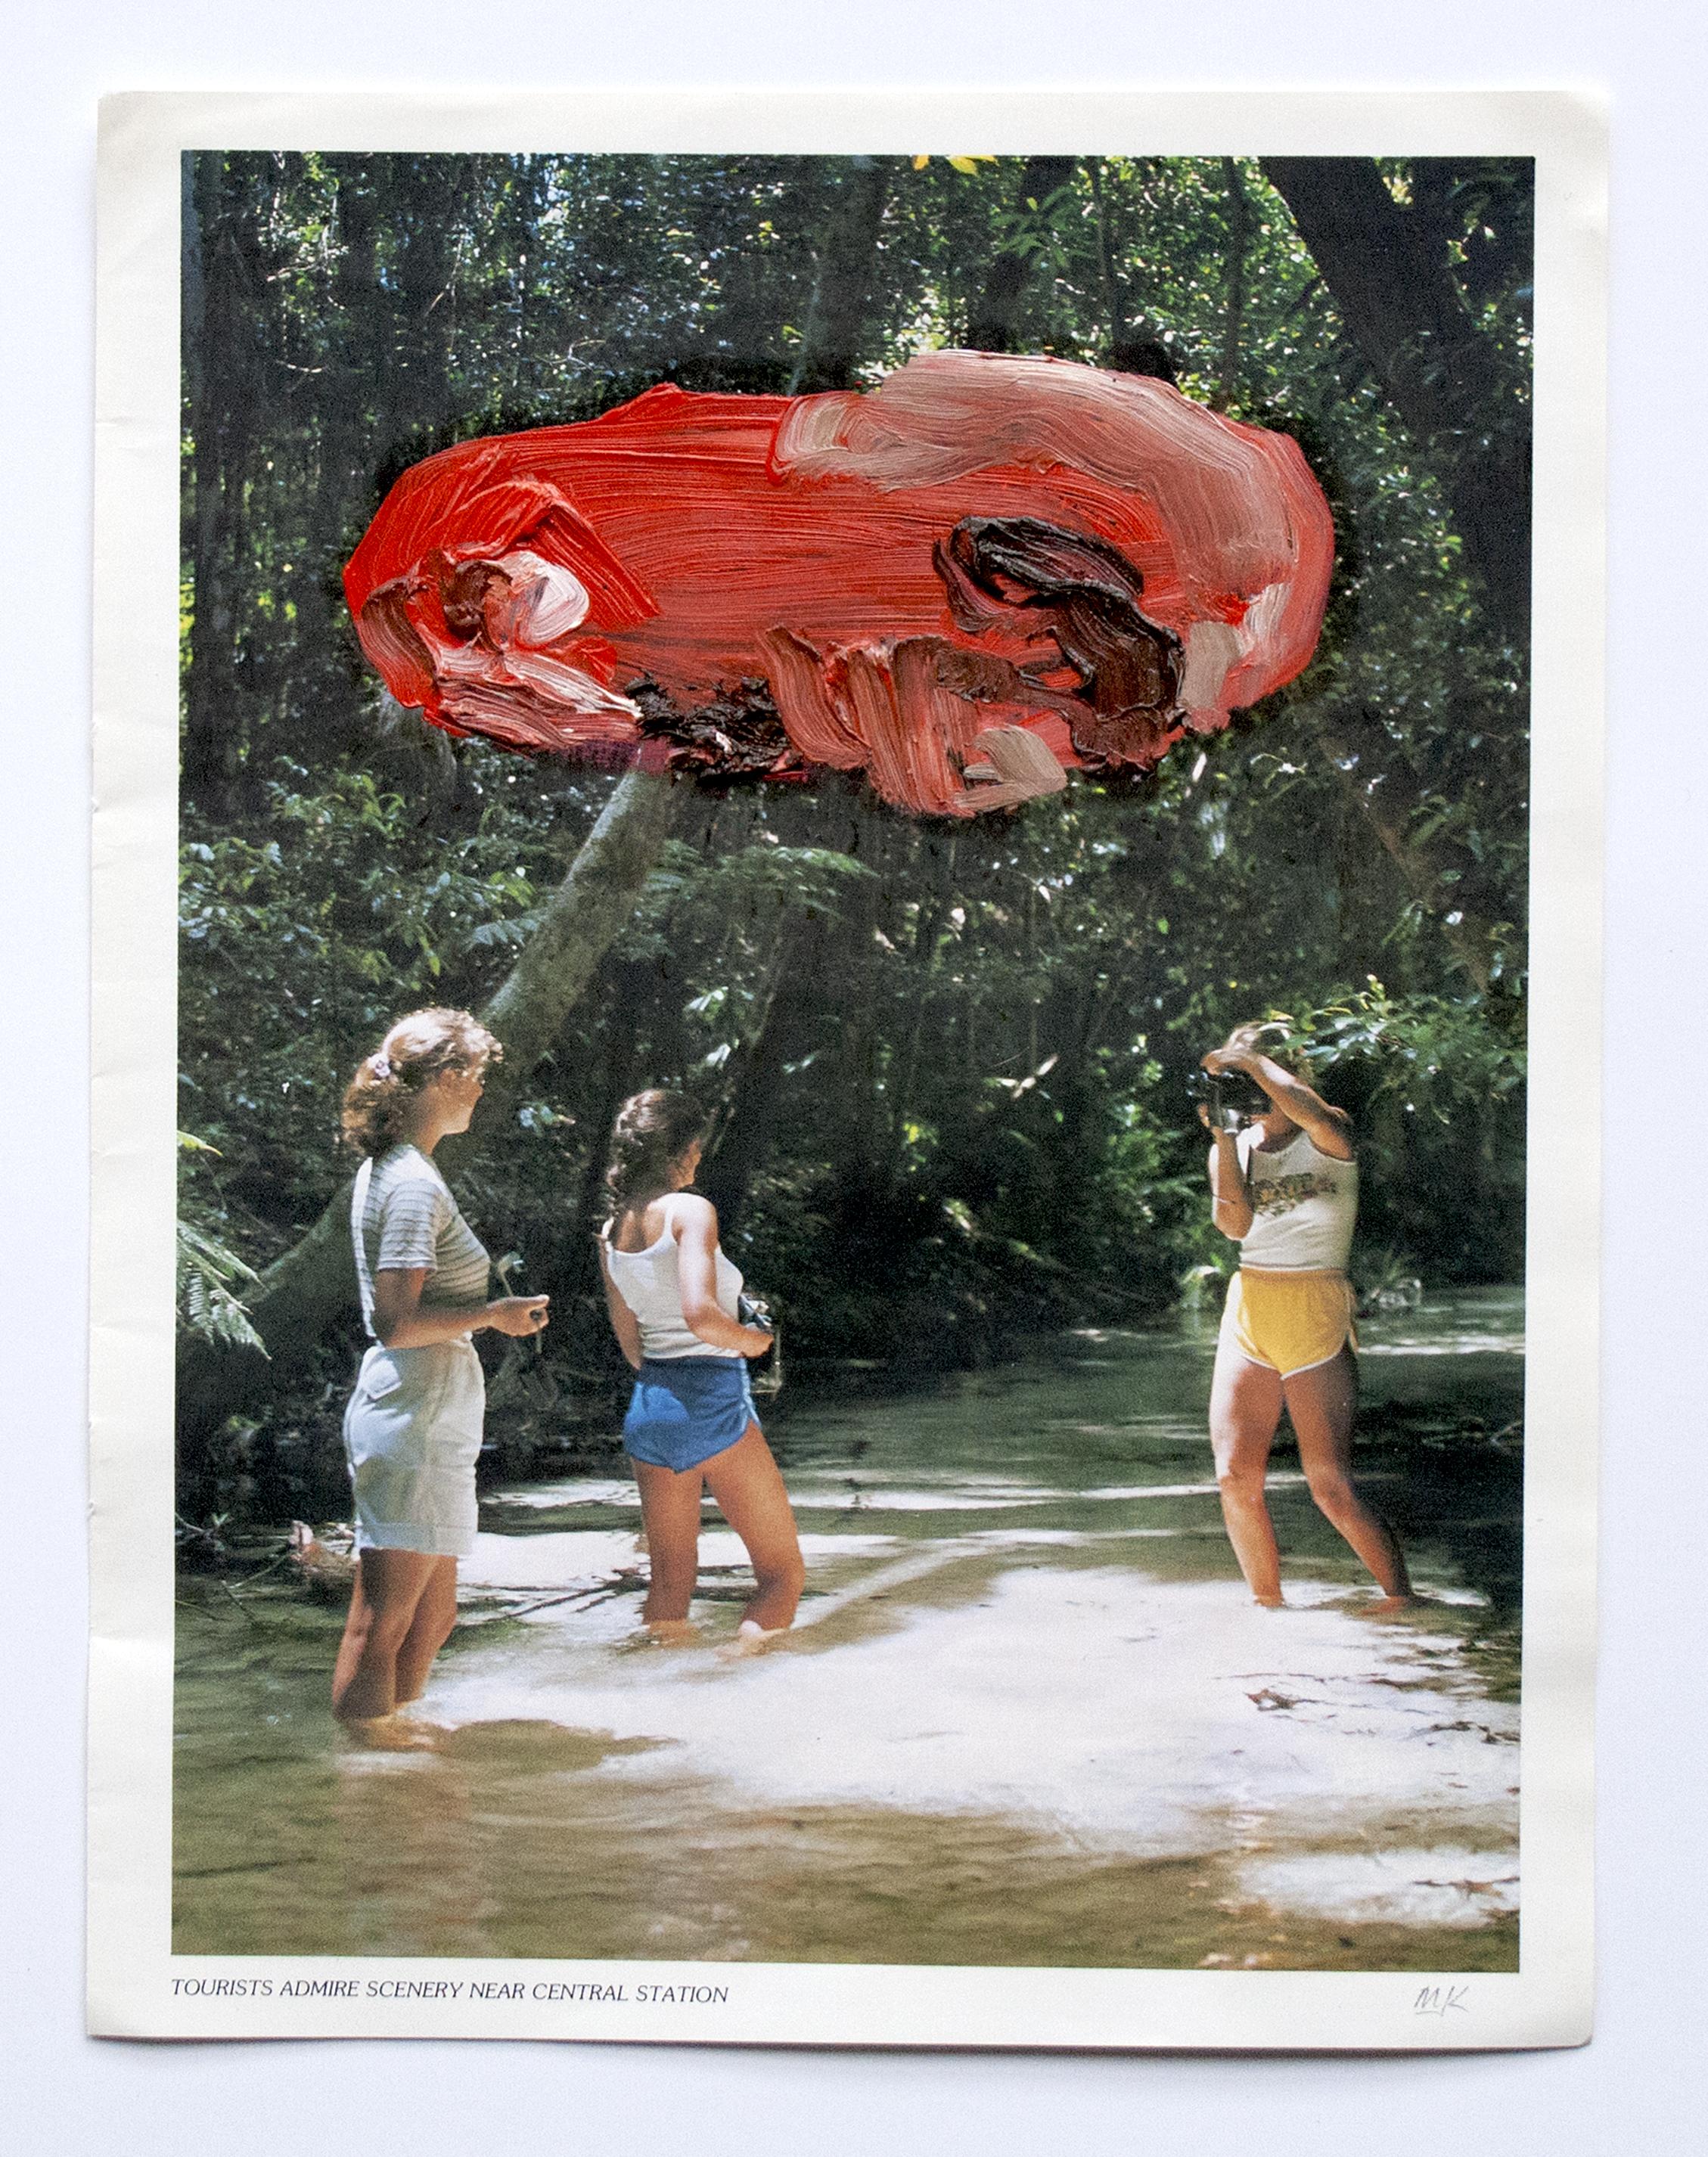 Tourists Admire The Scenery  2014  Oil and PVA glue on magazine  21 x 29.7 cm